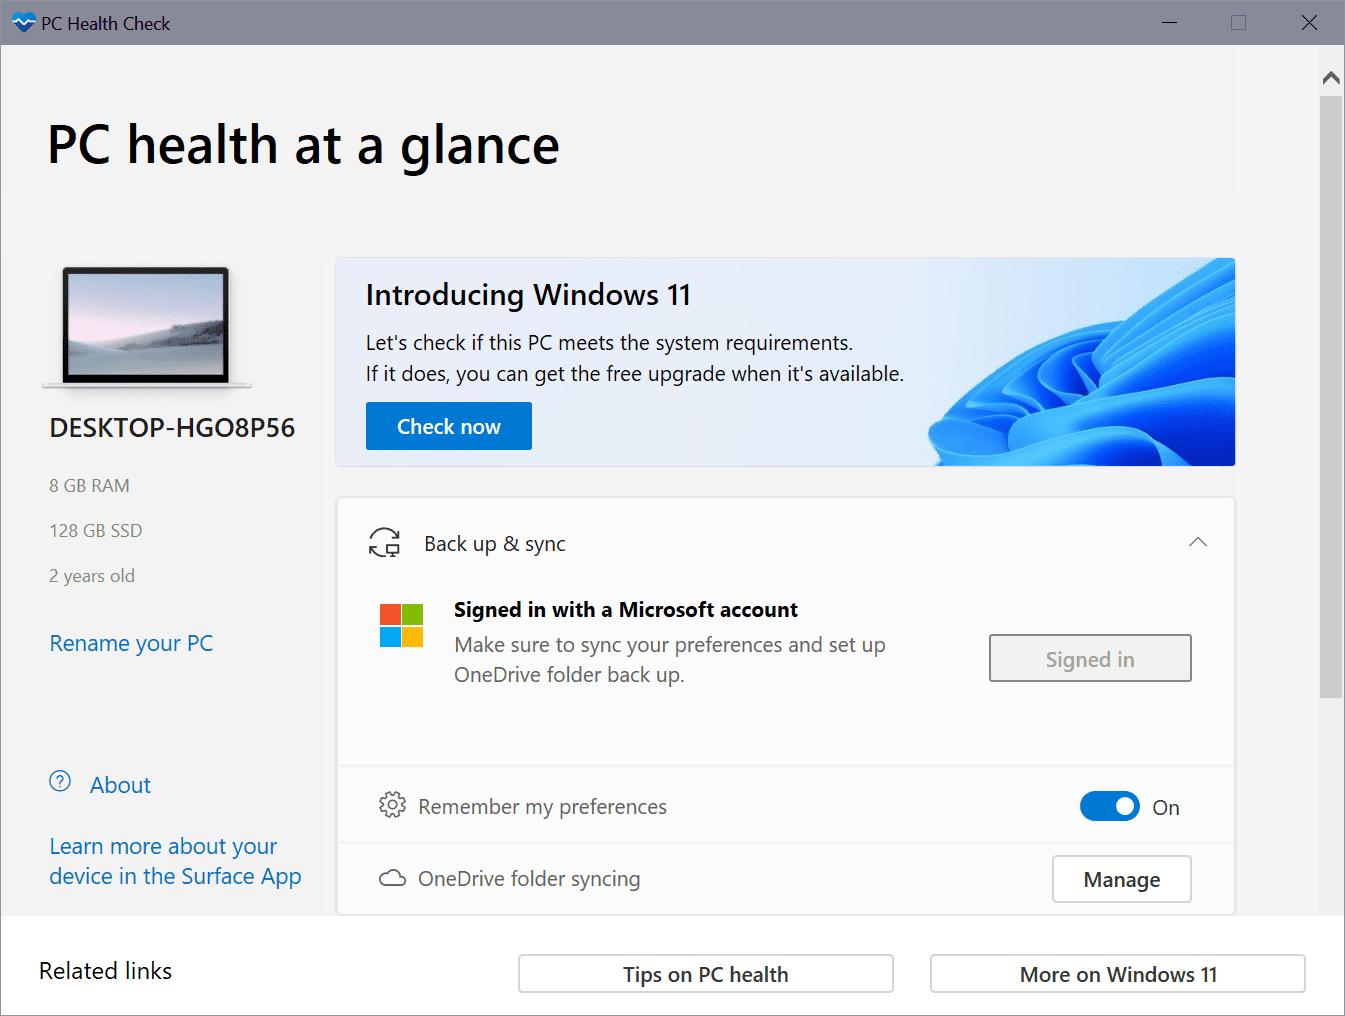 pc-health check app windows 10